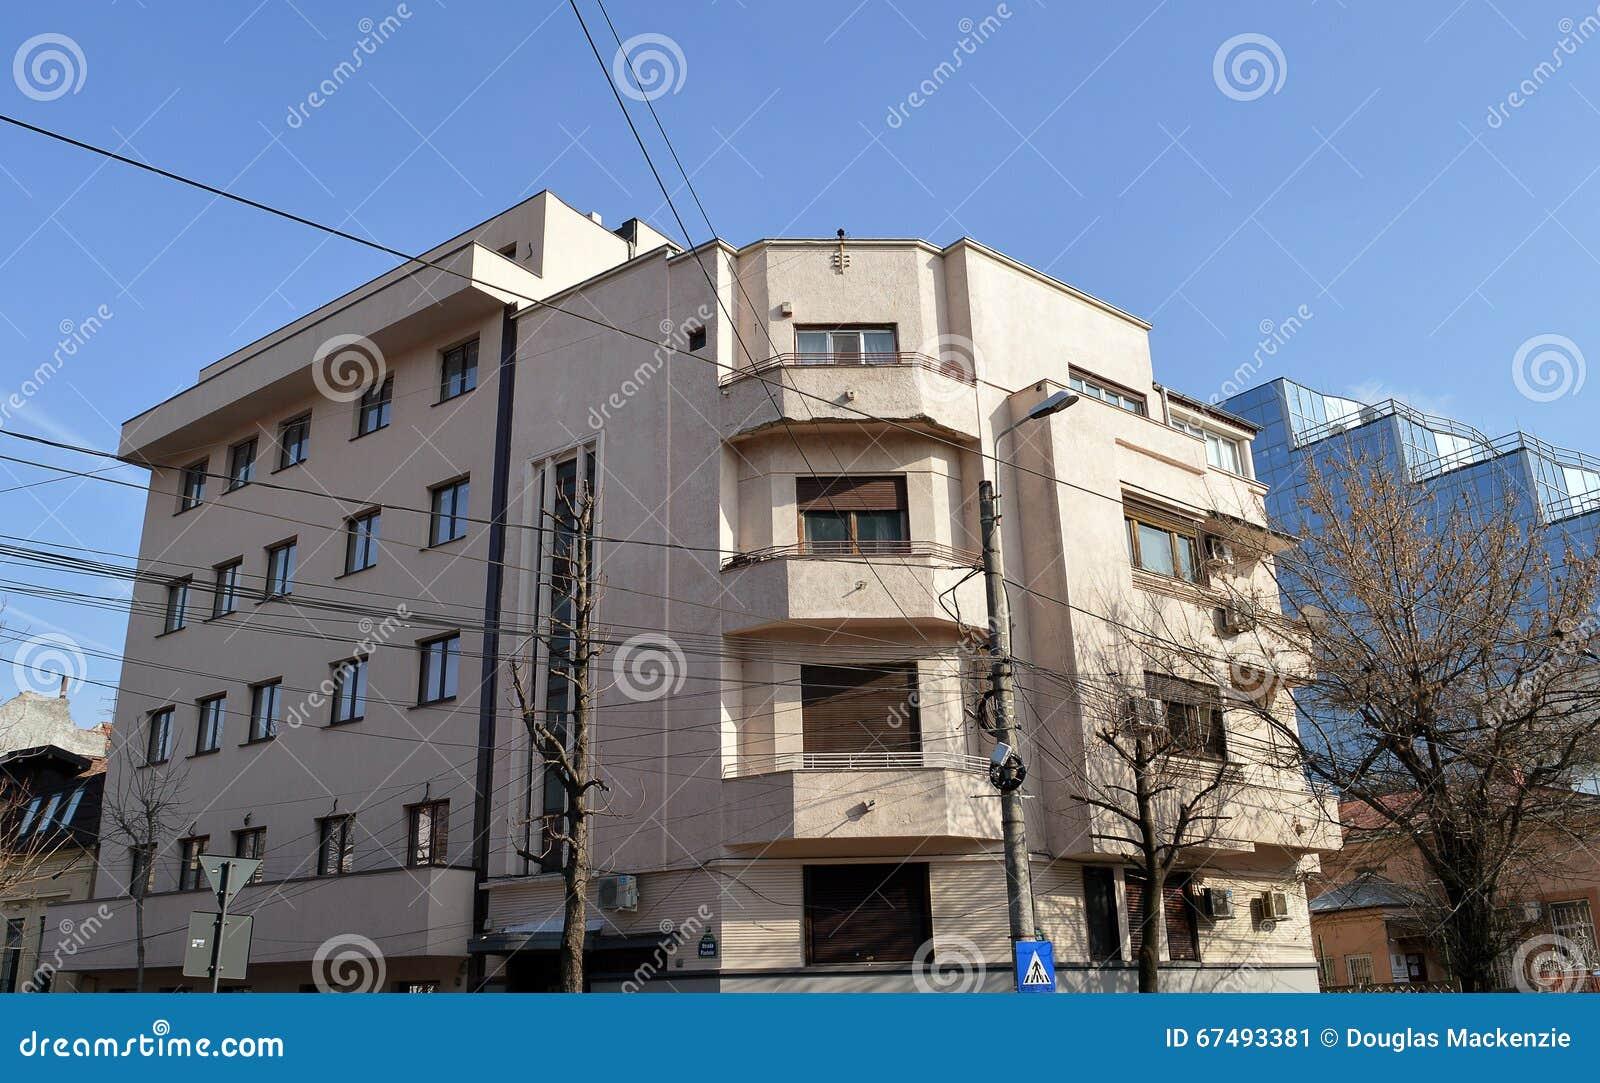 Art deco apartment block bucharest romania stock image for Bucharest apartments